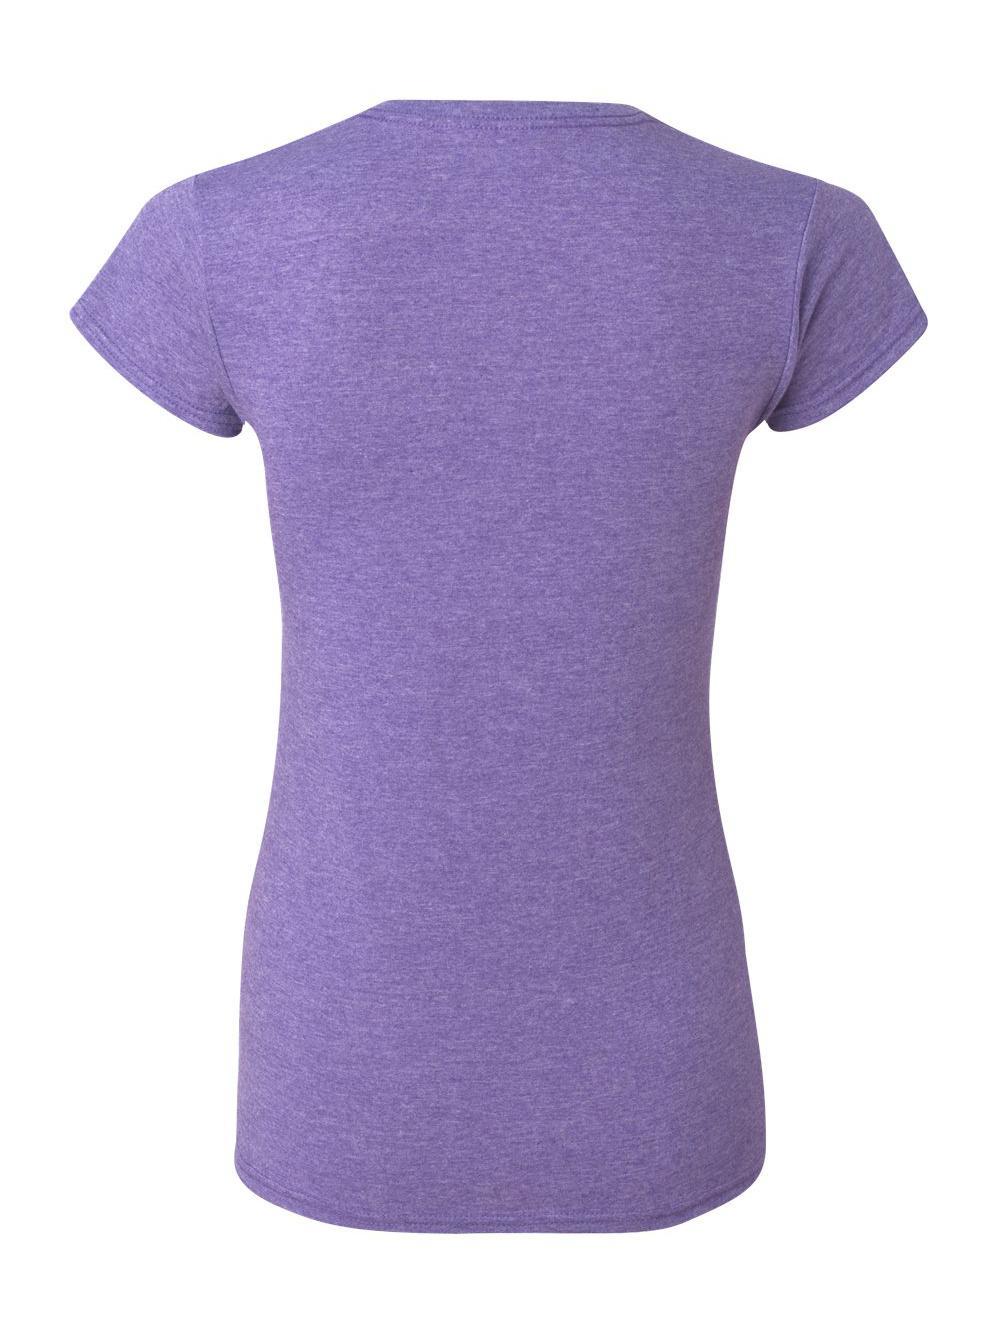 Gildan-Softstyle-Women-039-s-T-Shirt-64000L thumbnail 25